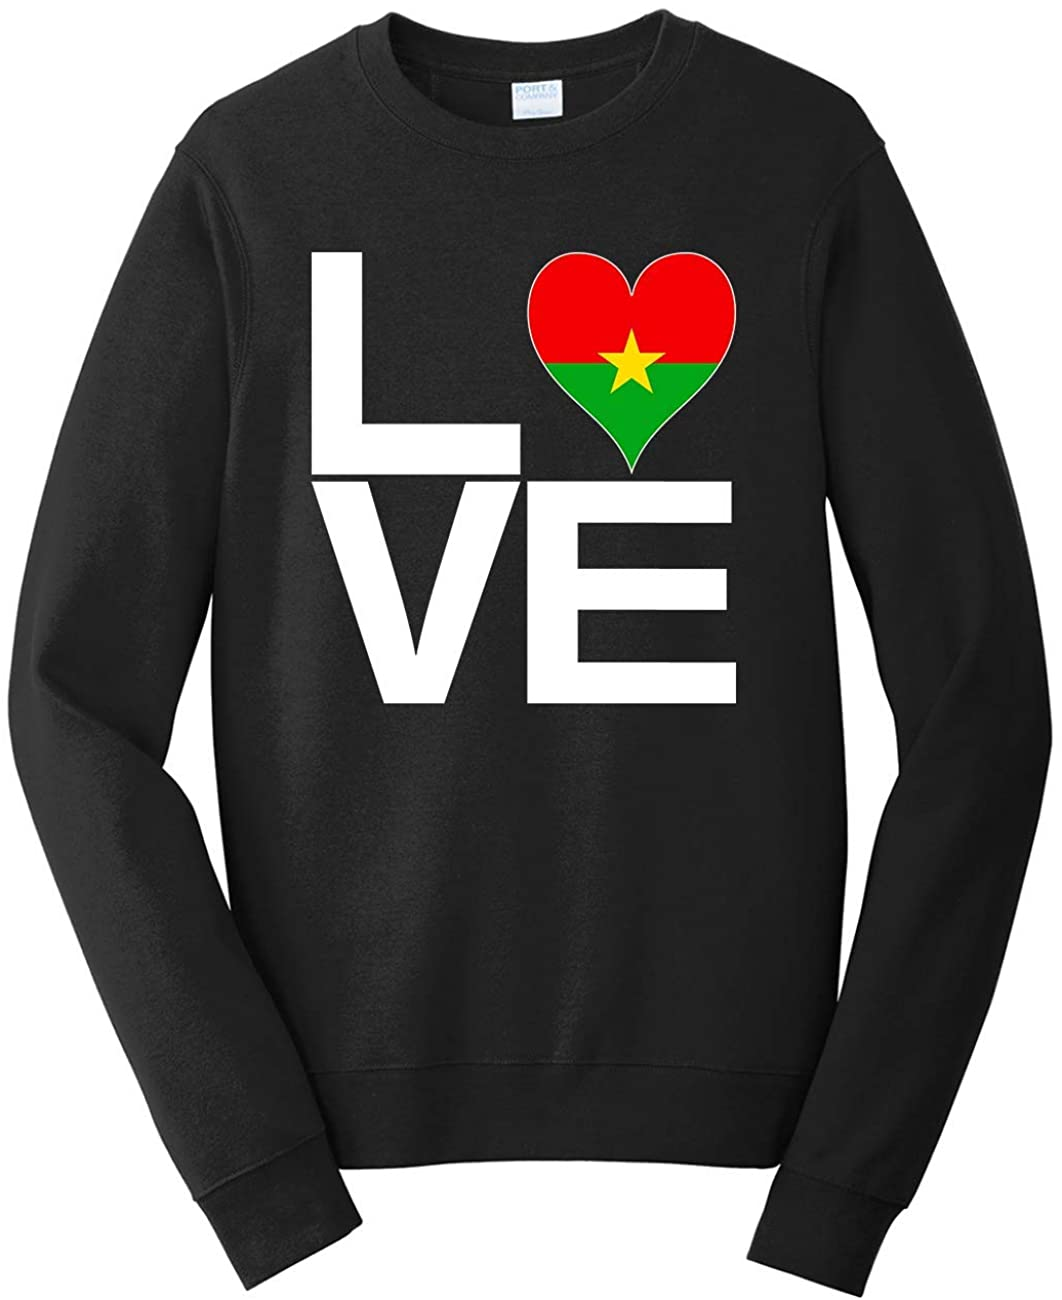 Tenacitee Men's Love Block Burkina Faso Heart Sweatshirt